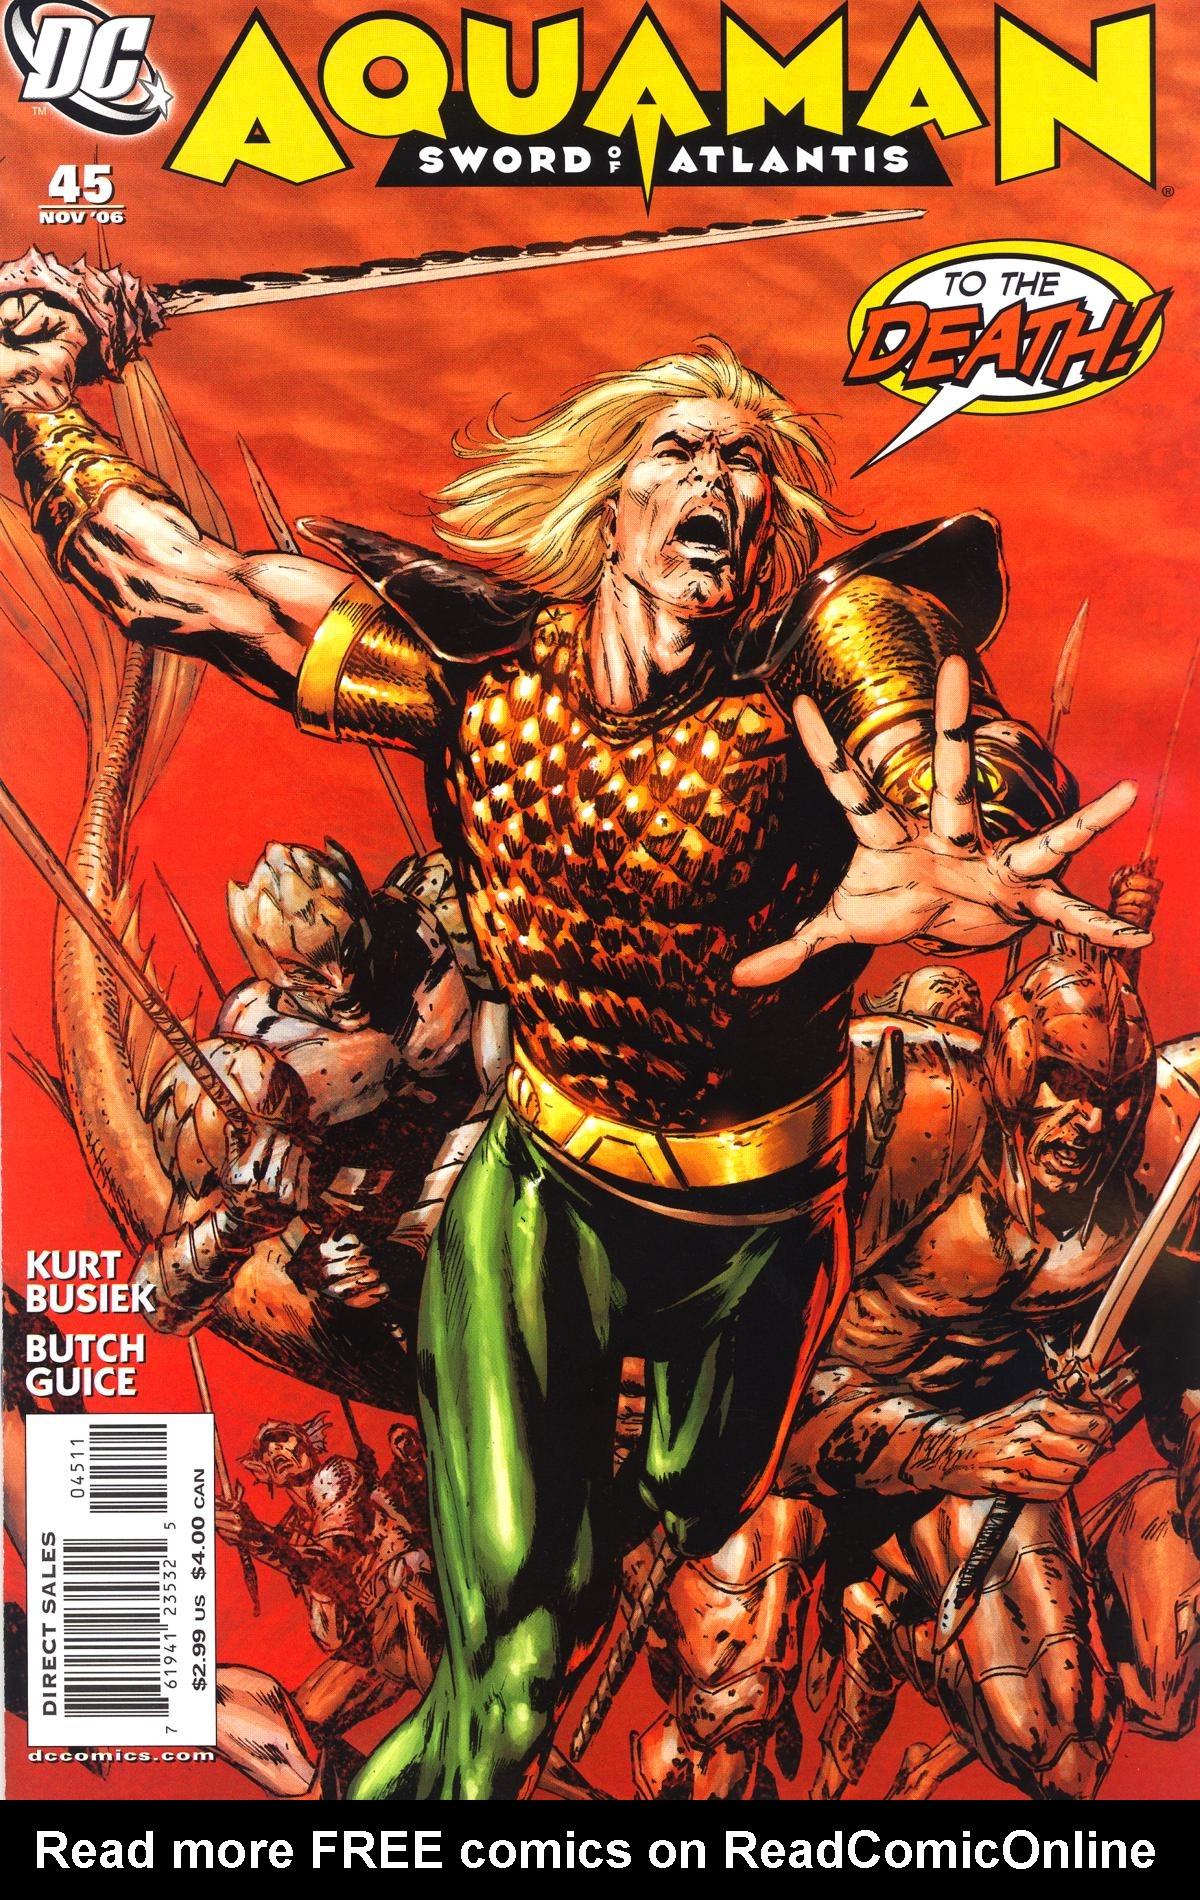 Aquaman: Sword of Atlantis 45 Page 1